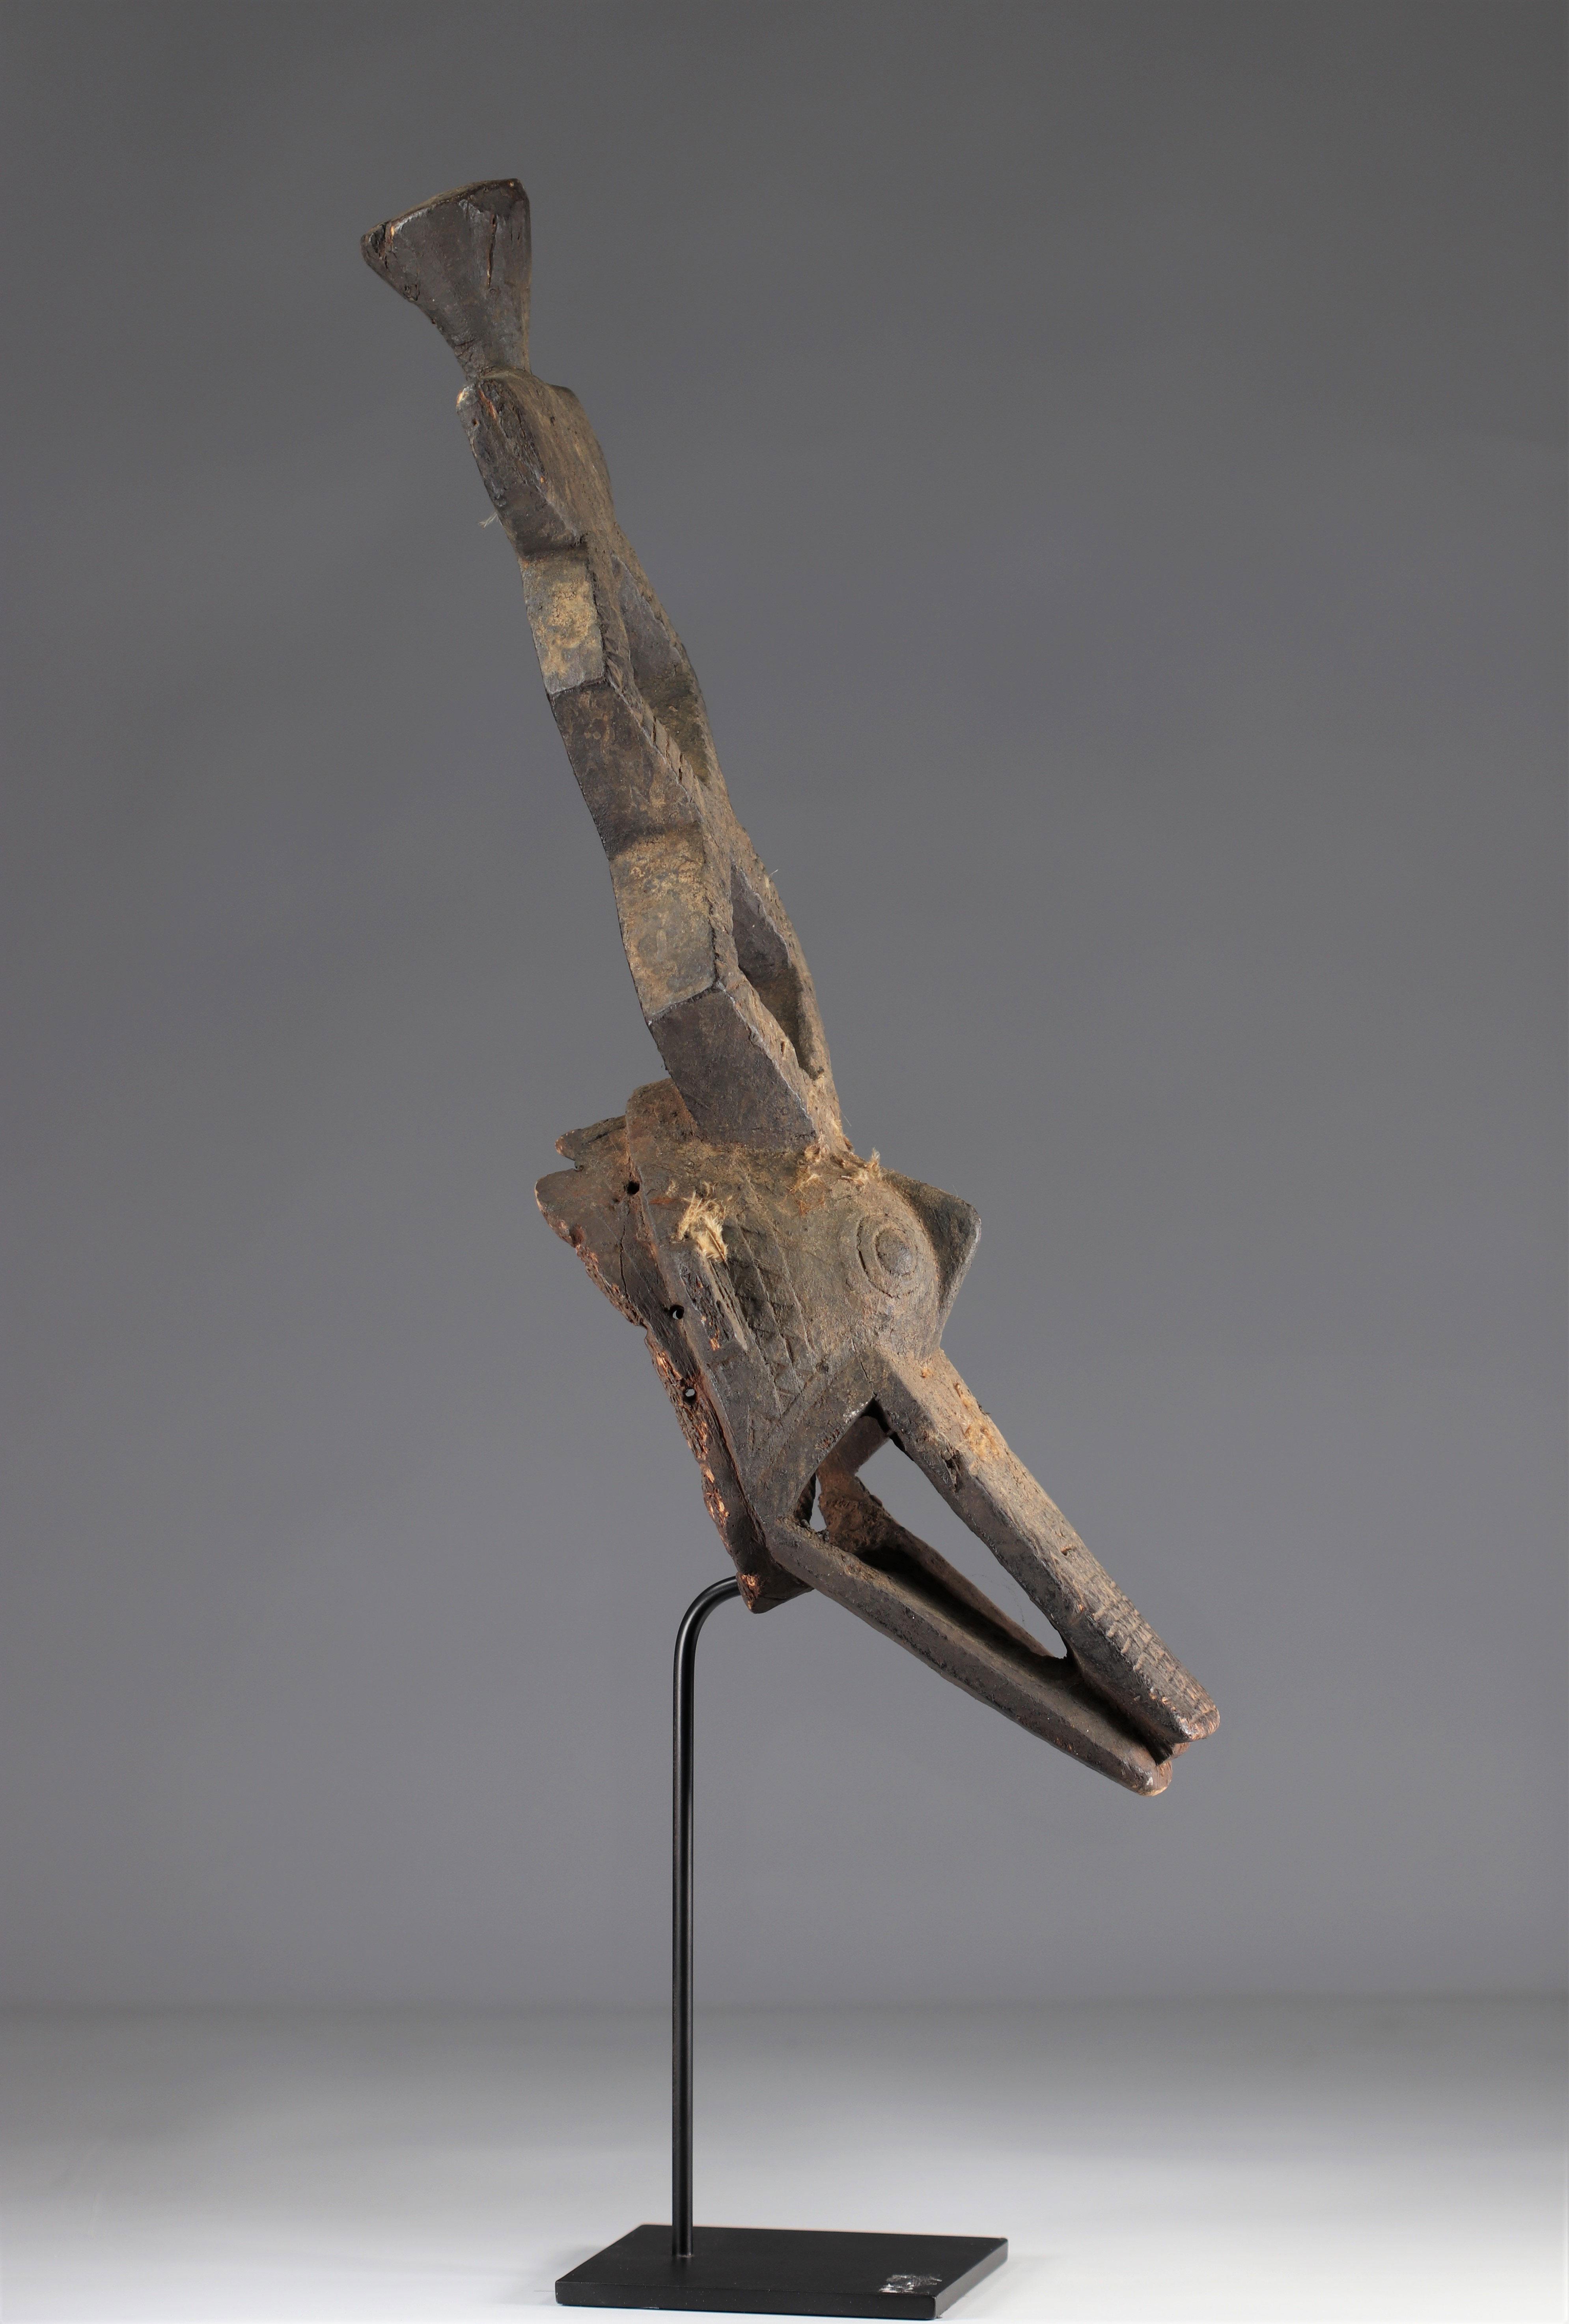 Ko Mask - Very old Ko caiman mask (Burkina Faso). Early 20th century. Very old black sacrificial pat - Image 4 of 5